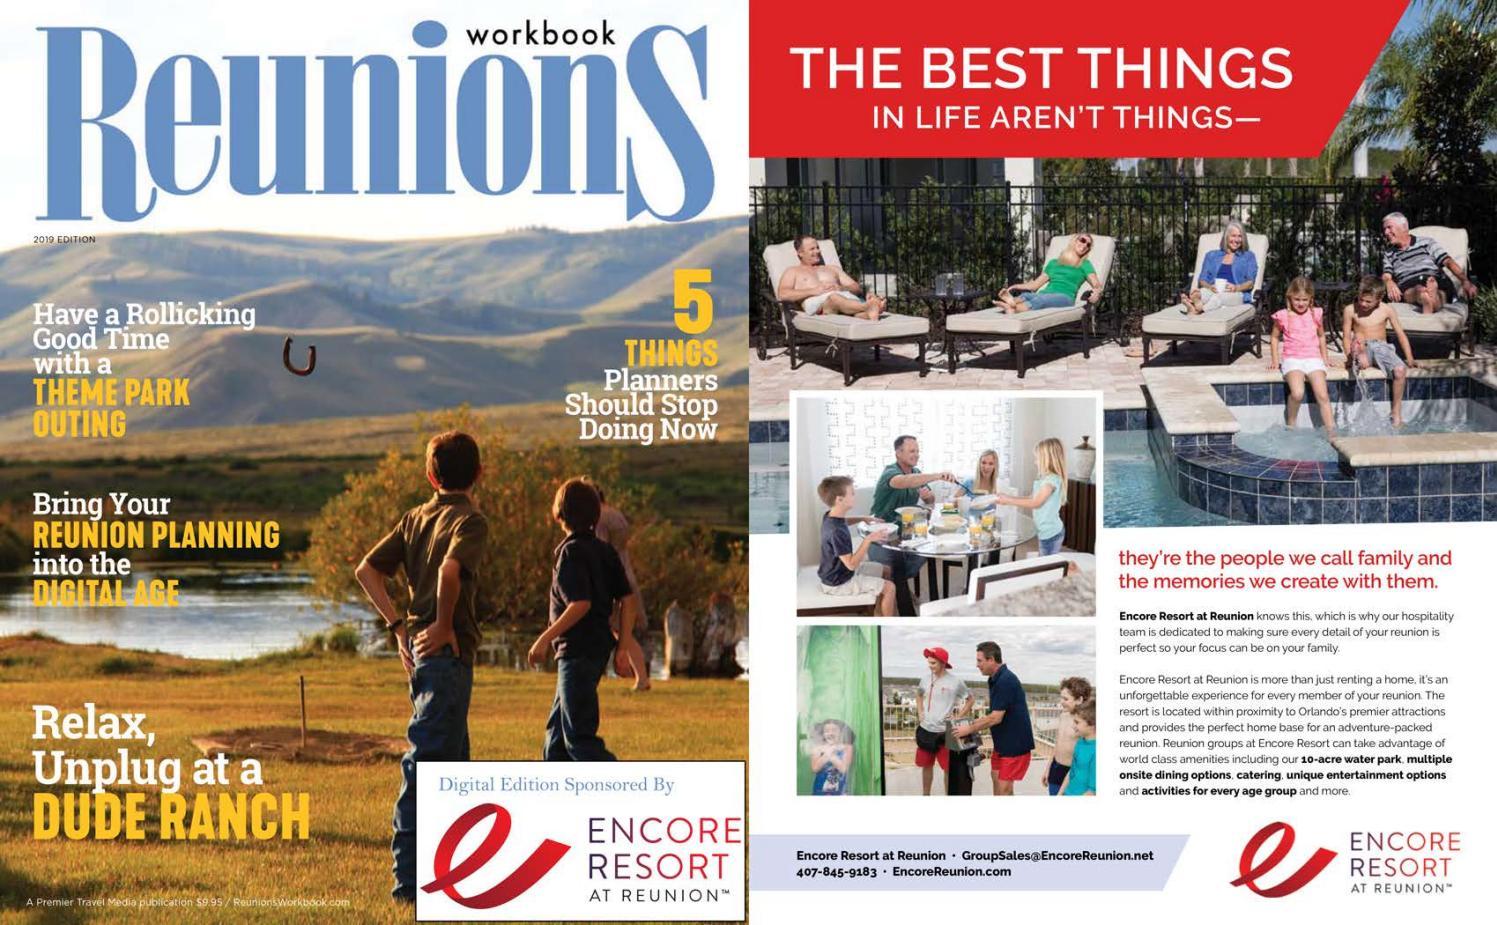 912bbc7b Reunions Workbook 2019 Edition by Premier Travel Media - issuu